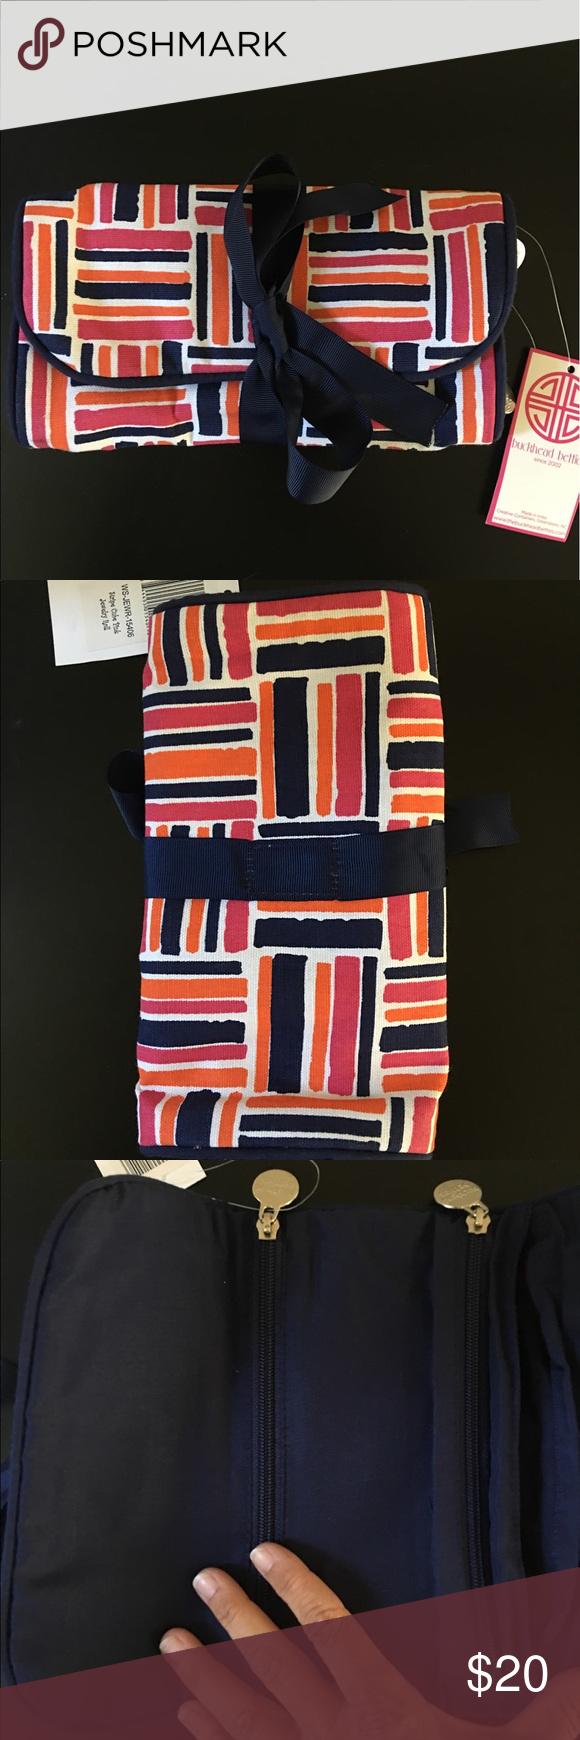 Buckhead Bettie's Navy Pink Orange Jewelry Bag New